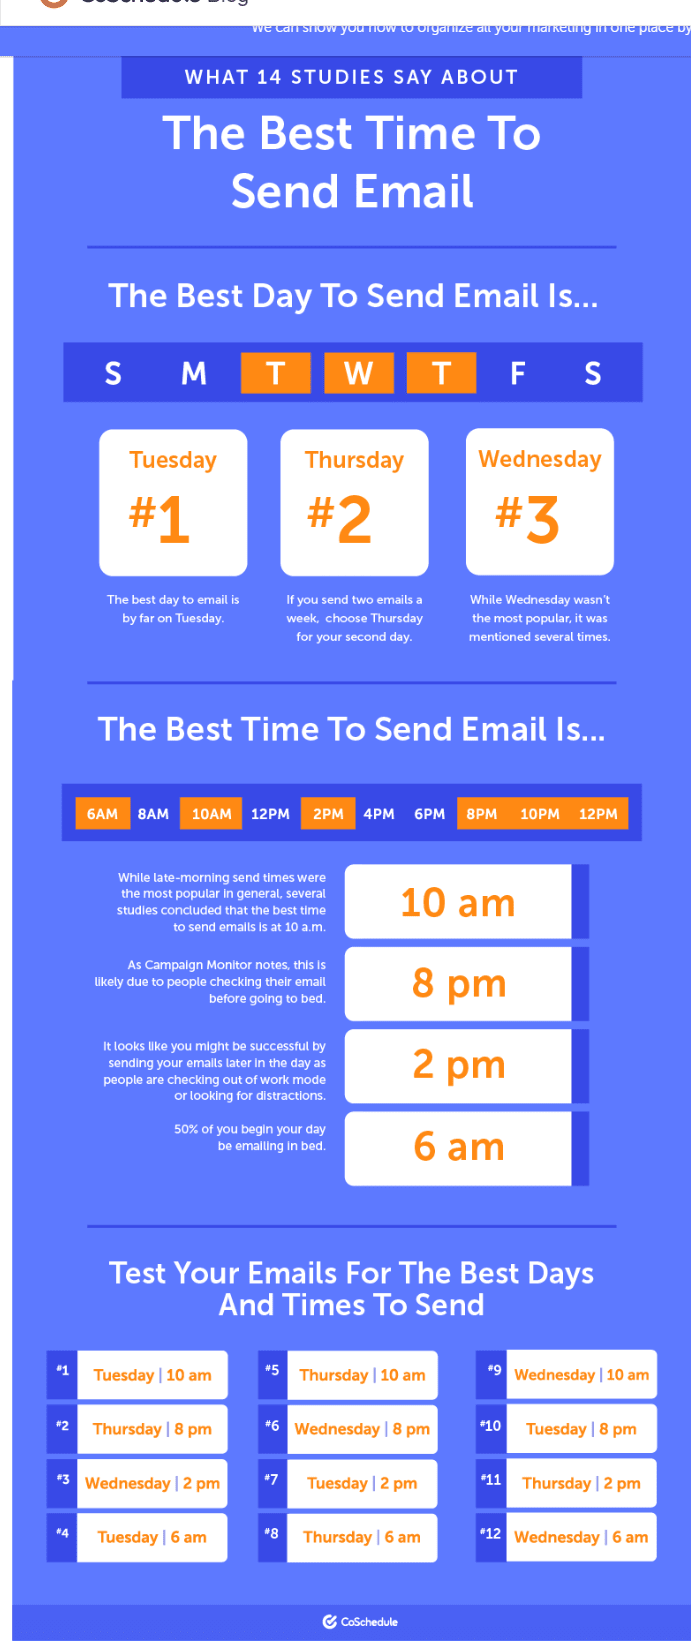 5 Practical Email Marketing Tips for Aspiring Digital